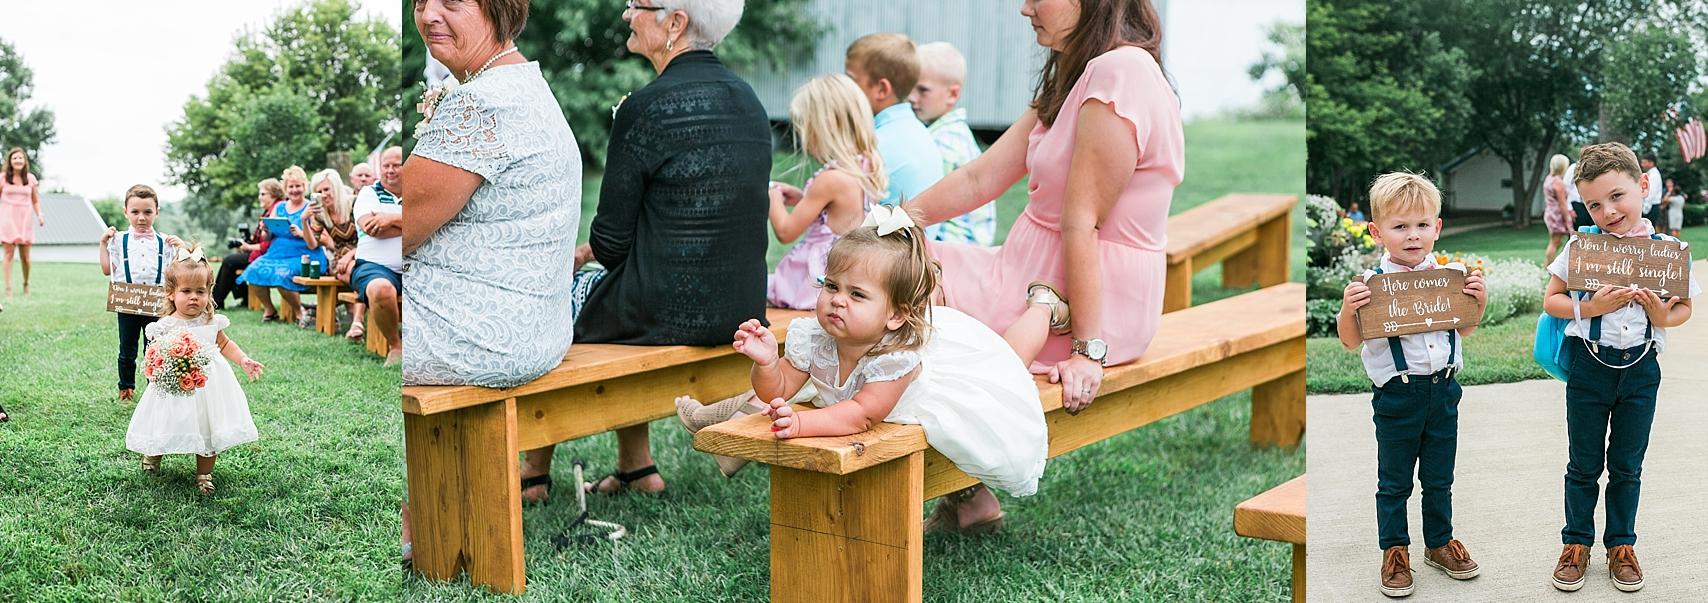 Minnesota Minneapolis Wedding Photographer Best Of 2018 Weddings Mallory Kiesow Photography_0015.jpg